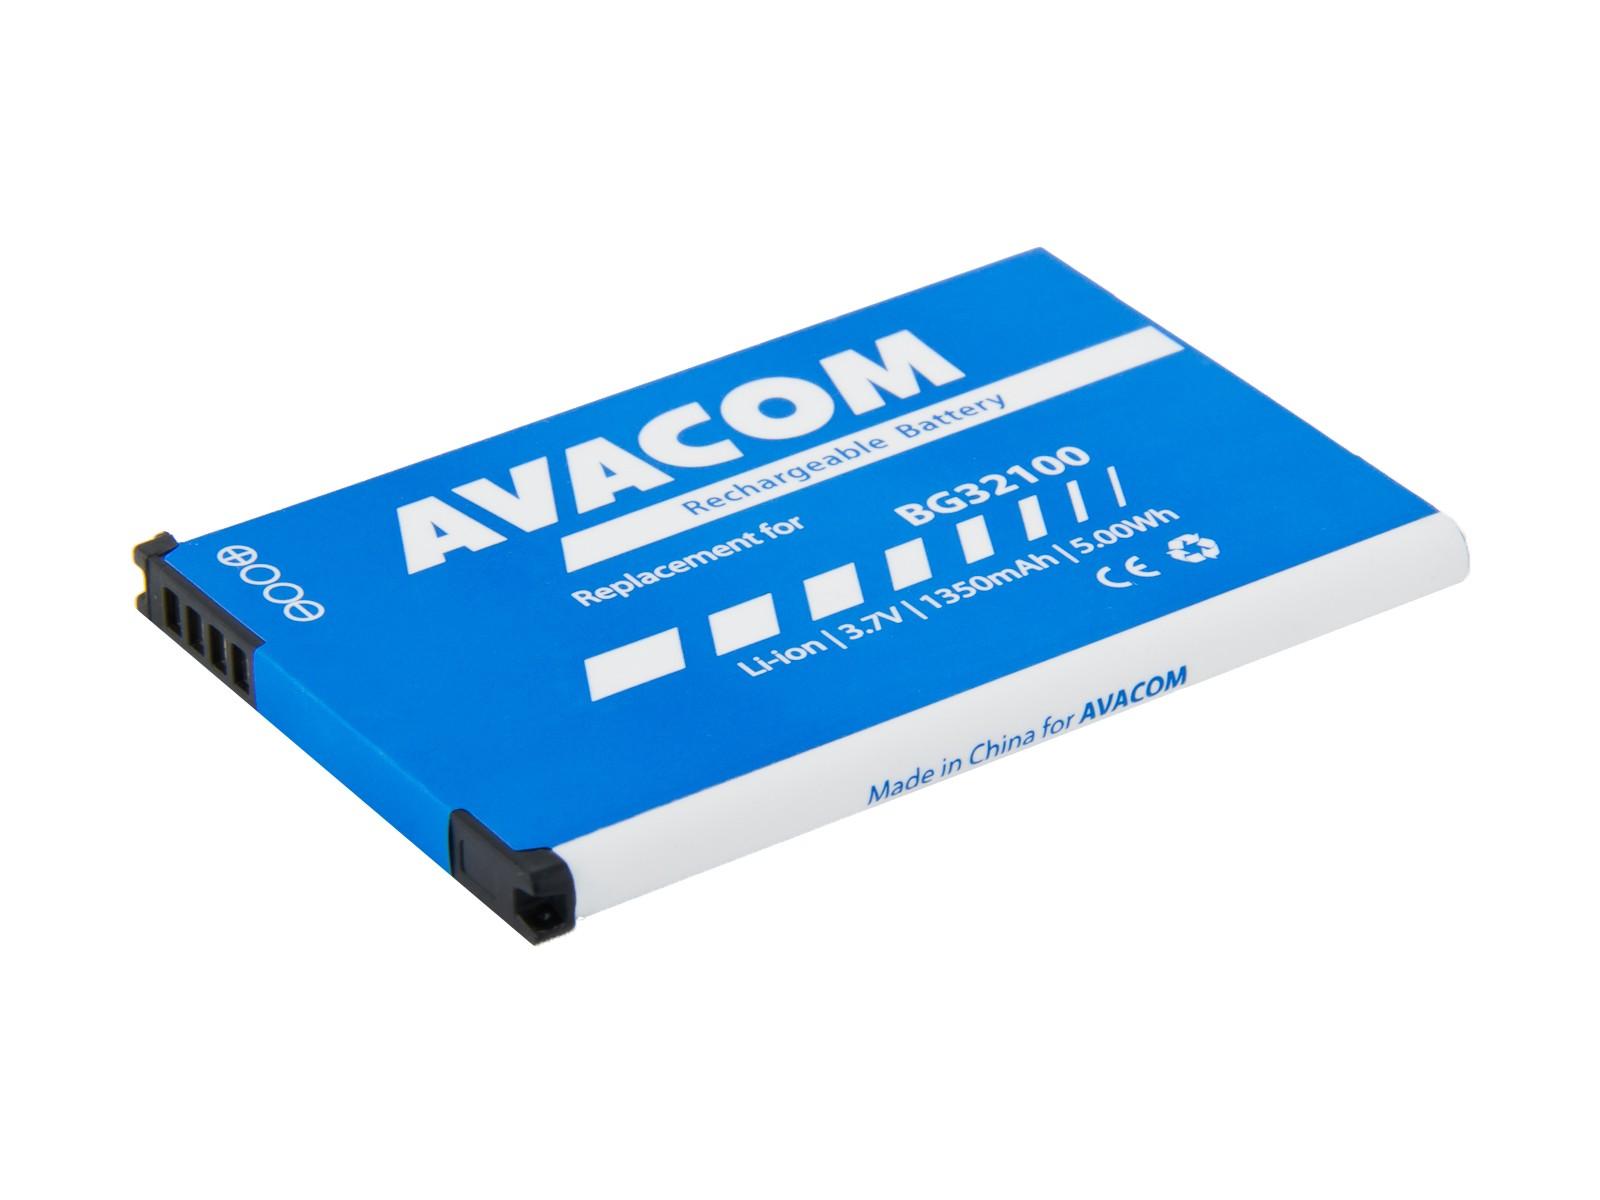 Baterie AVACOM PDHT-S710-1350 do mobilu HTC Desire Z Li-Ion 3,7V 1350mAh (náhrada BG32100)